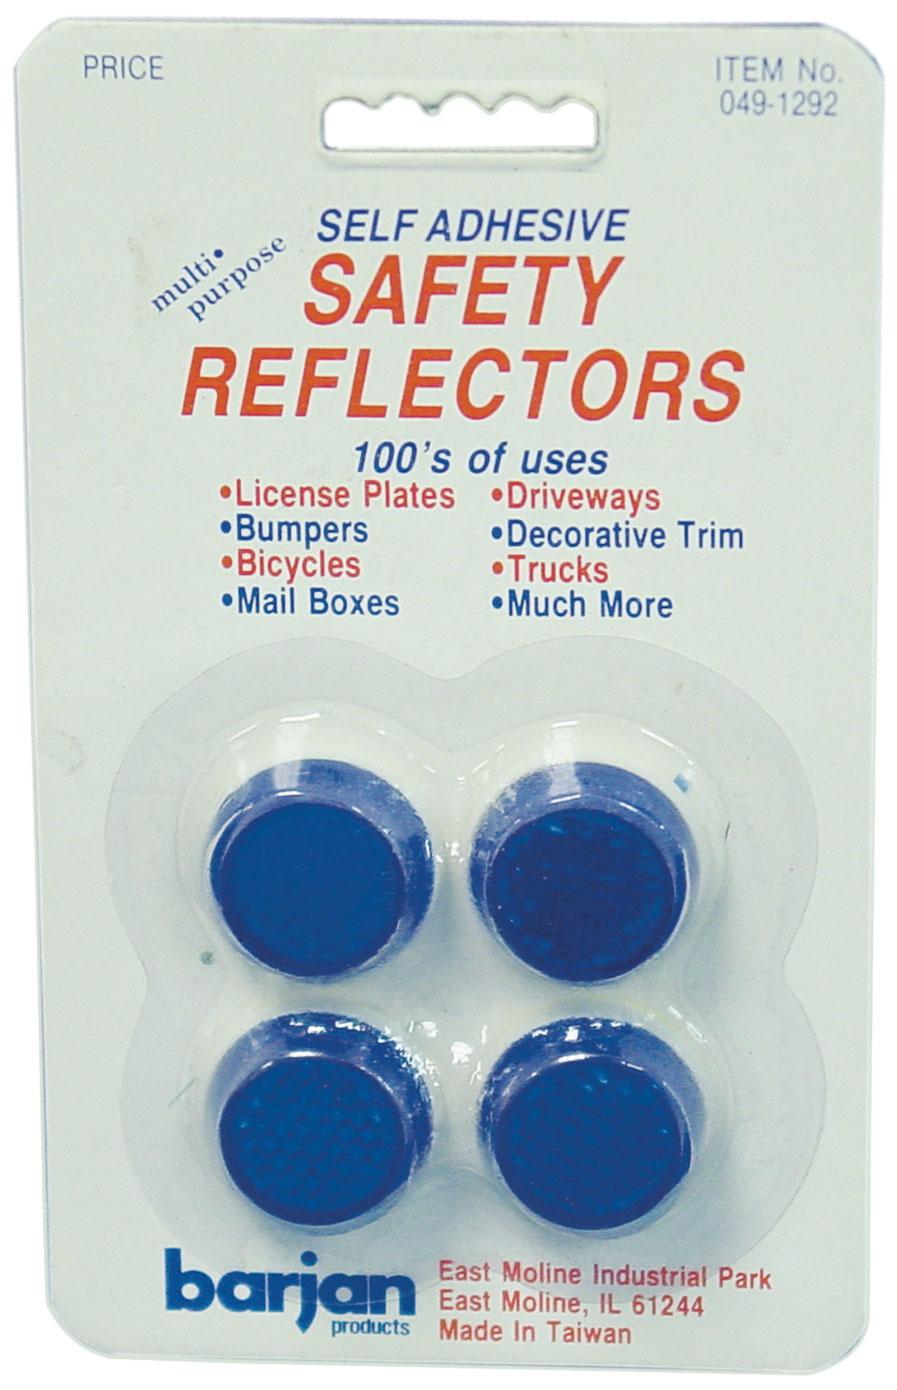 BARJAN MULTI-PURPOSE MINI BLUE ROUND SELF ADHESIVE SAFETY REFLECTORS - 4 PER CARD